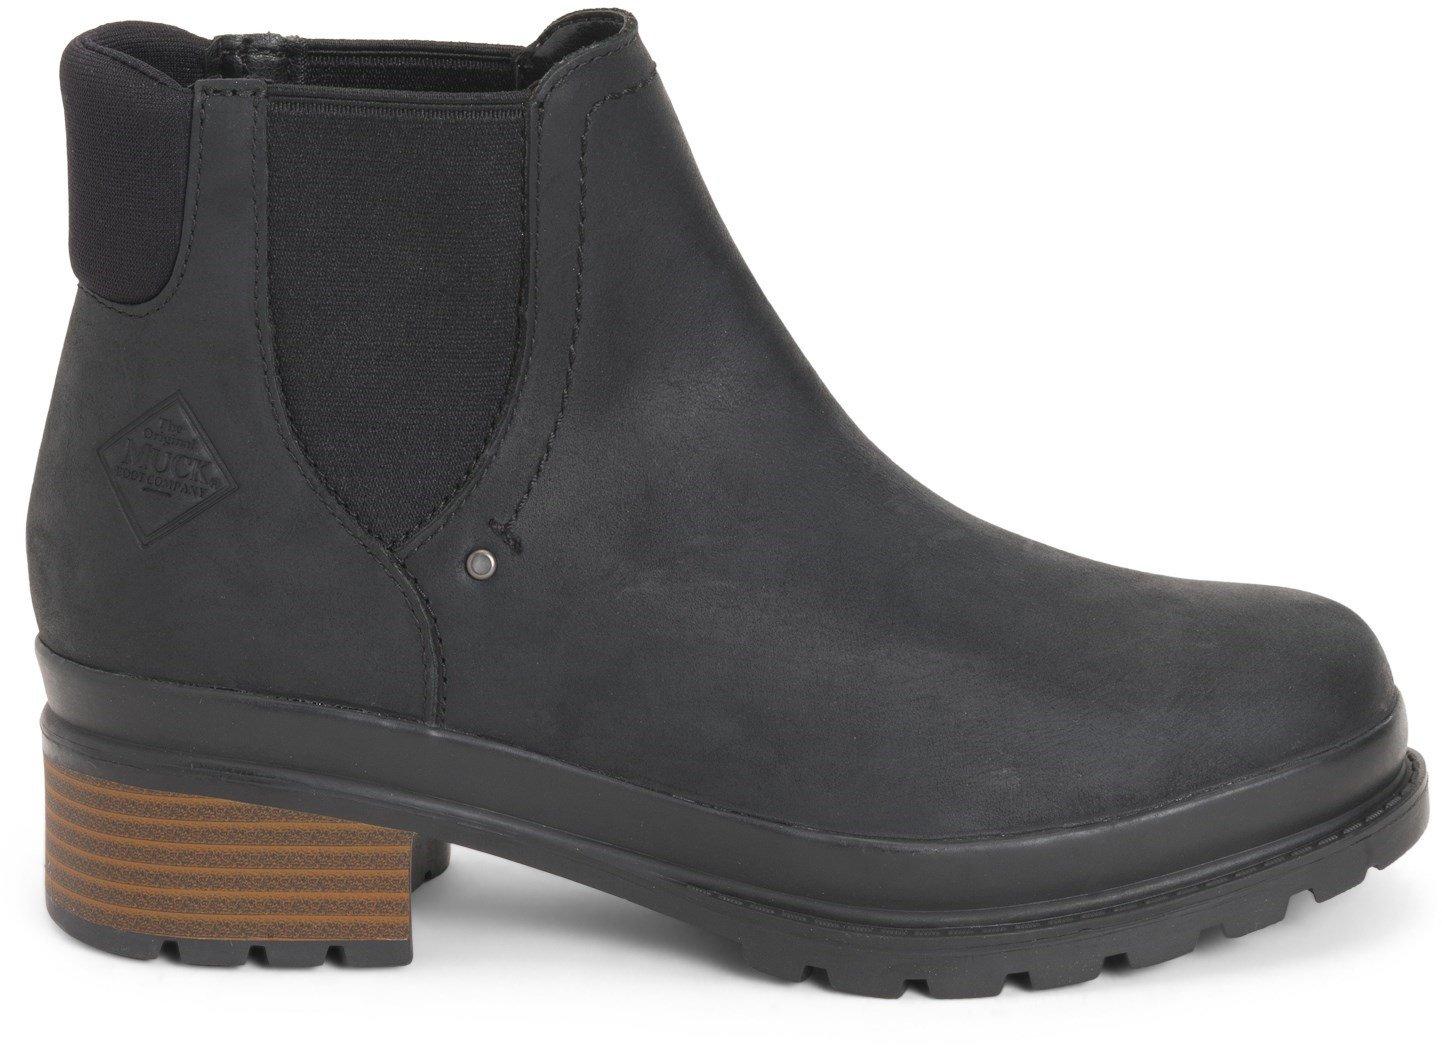 Muck Boots Women's Liberty Chelsea Boot Various Colours 31762 - Black 8